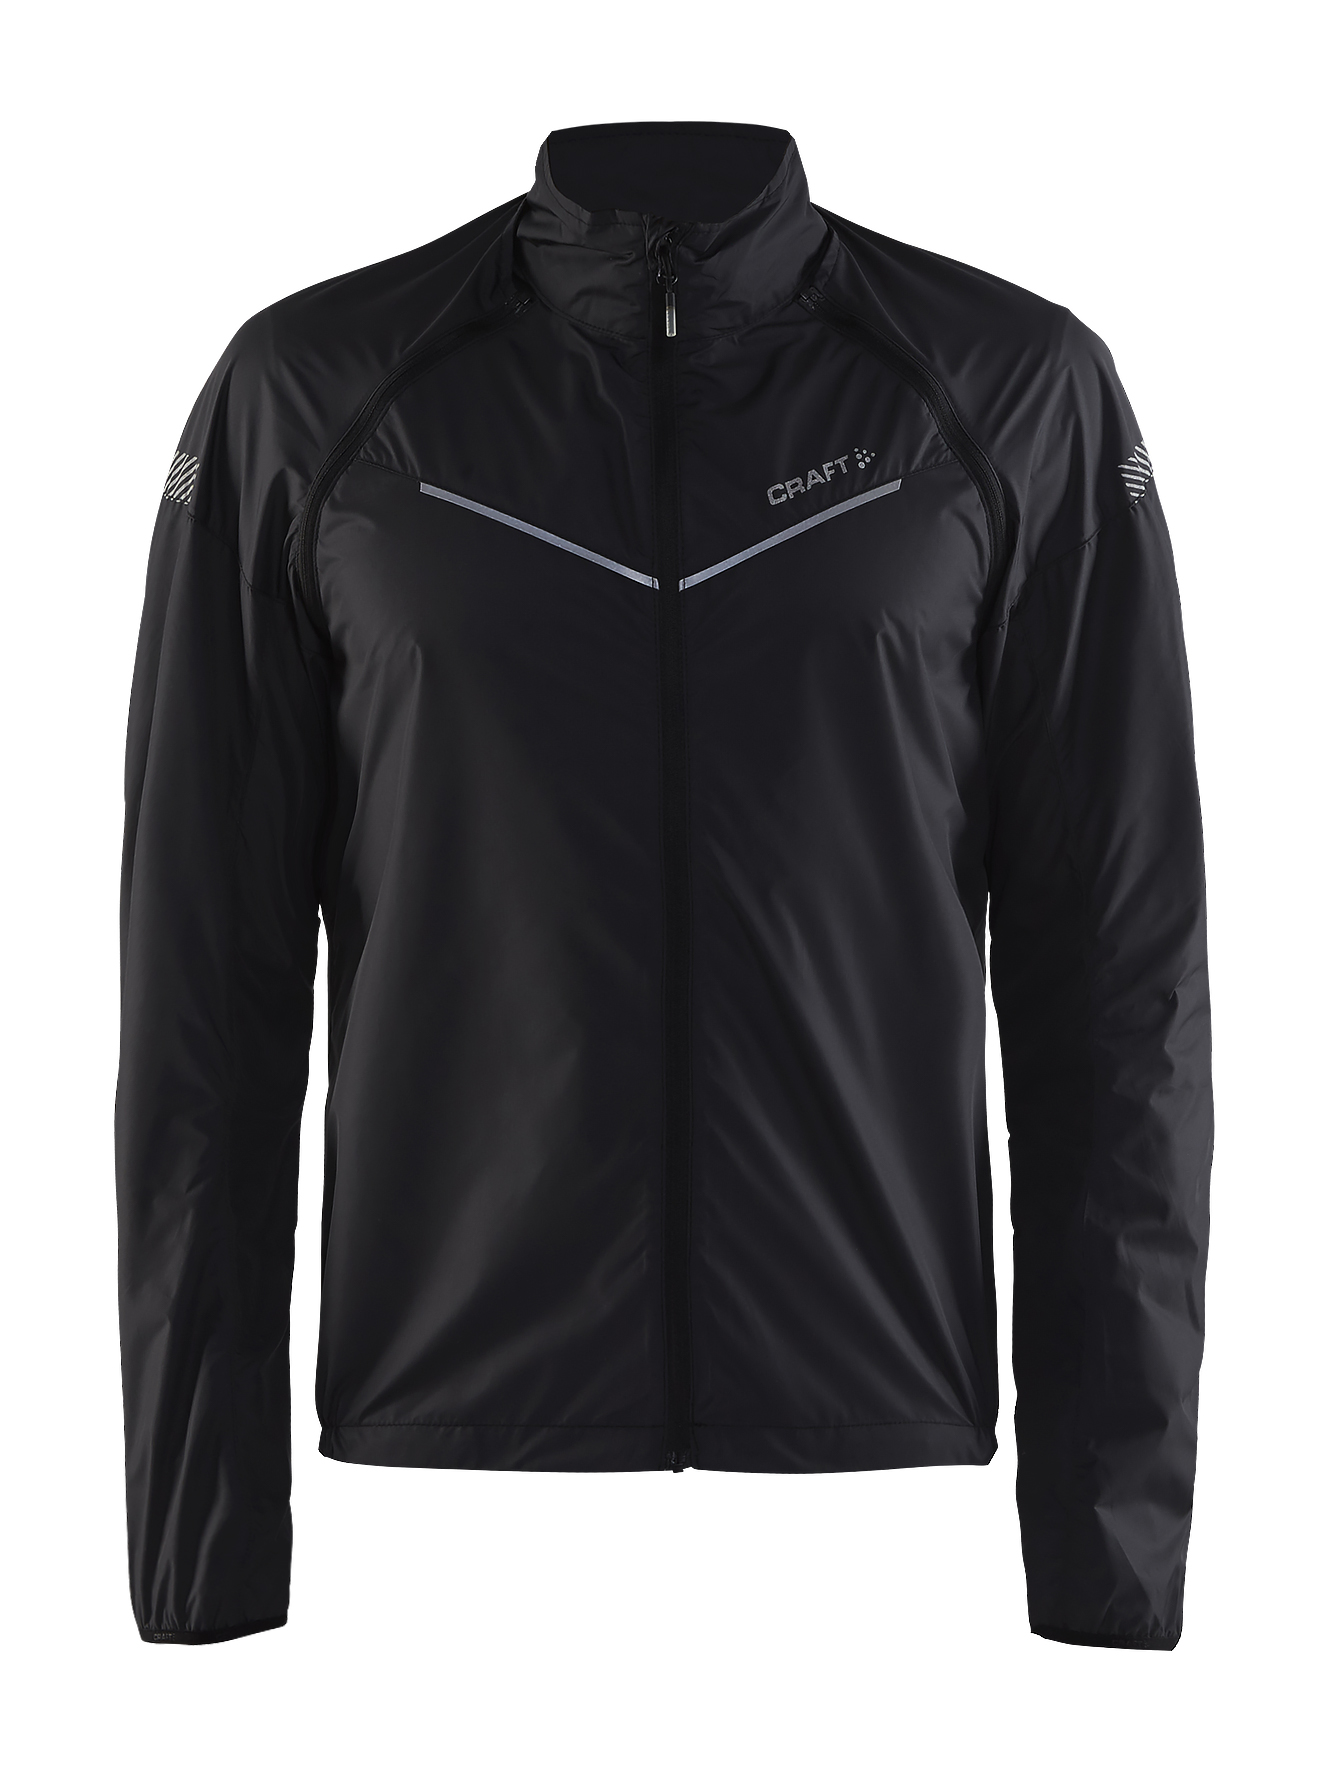 Details about  /Craft Men/'s Convert Jacket Velo